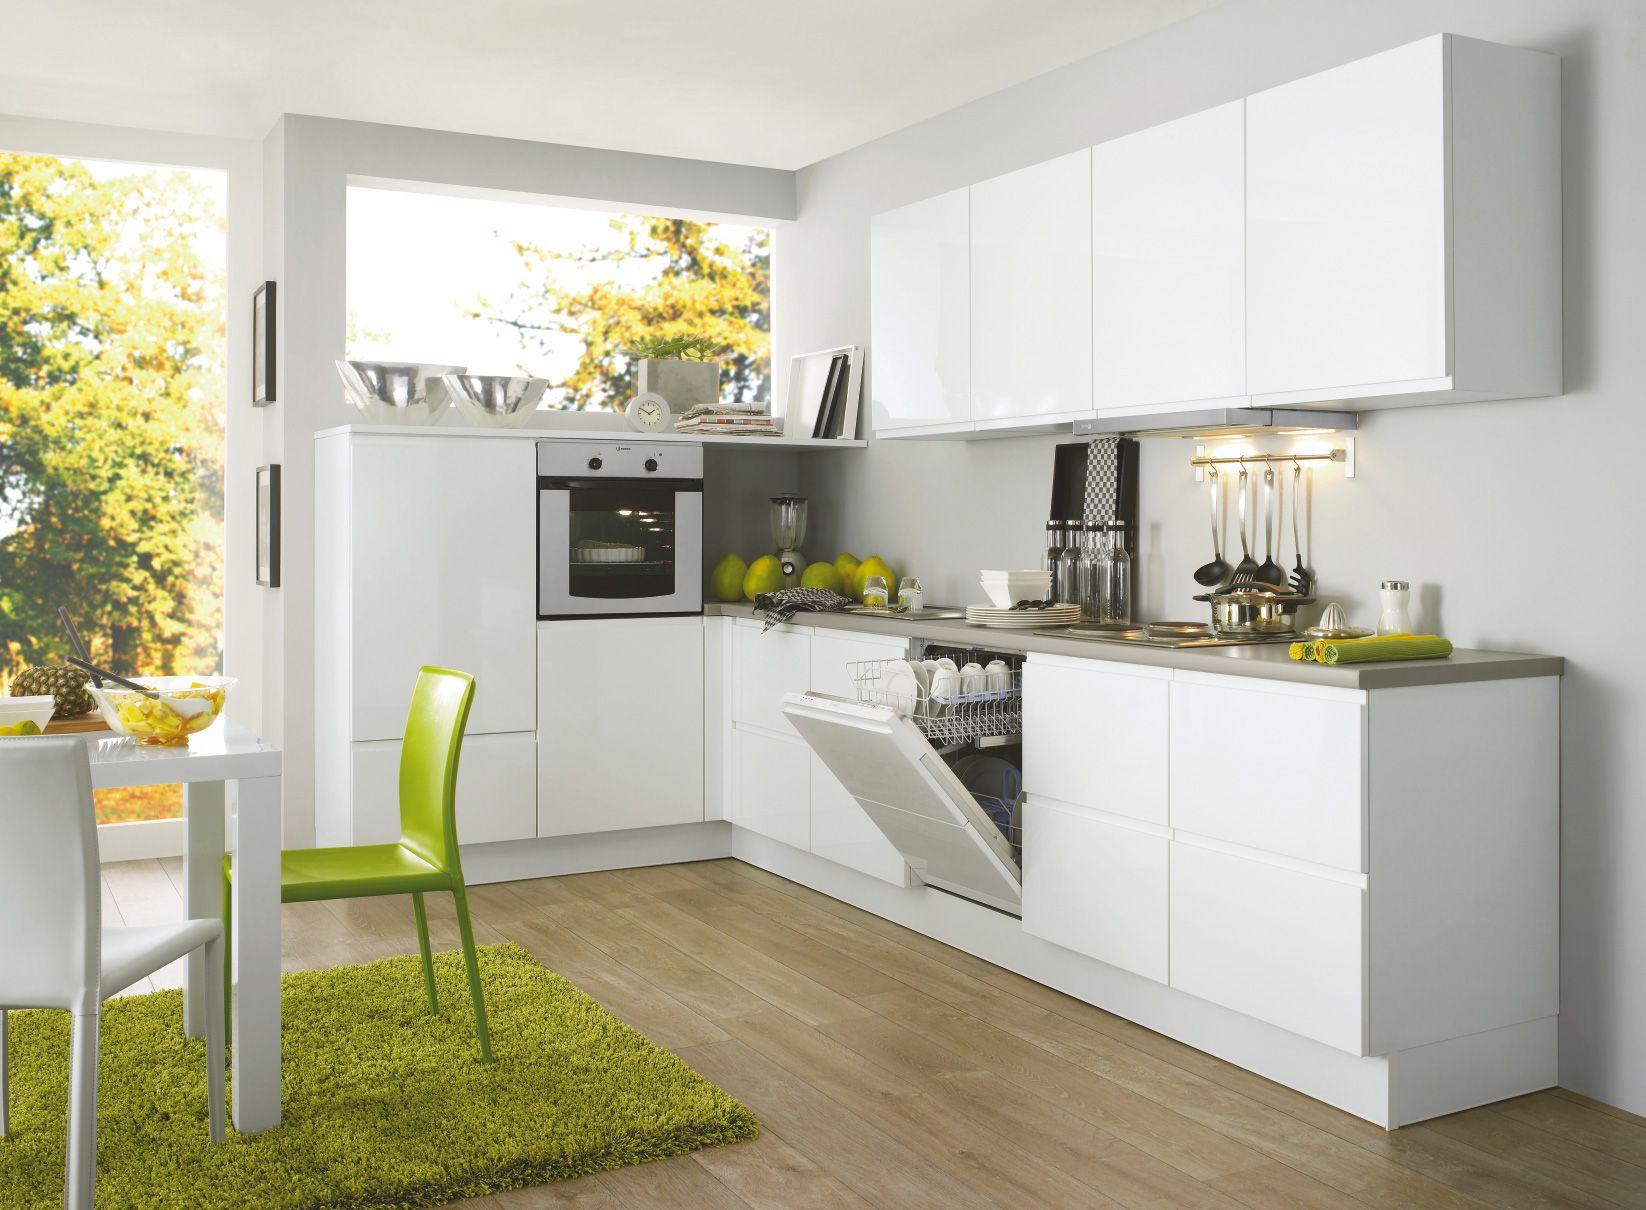 Color Verde Para Cocina Jpg 1646 1210 Used Kitchen Cabinets Kitchen Cabinets Wood Kitchen Cabinets